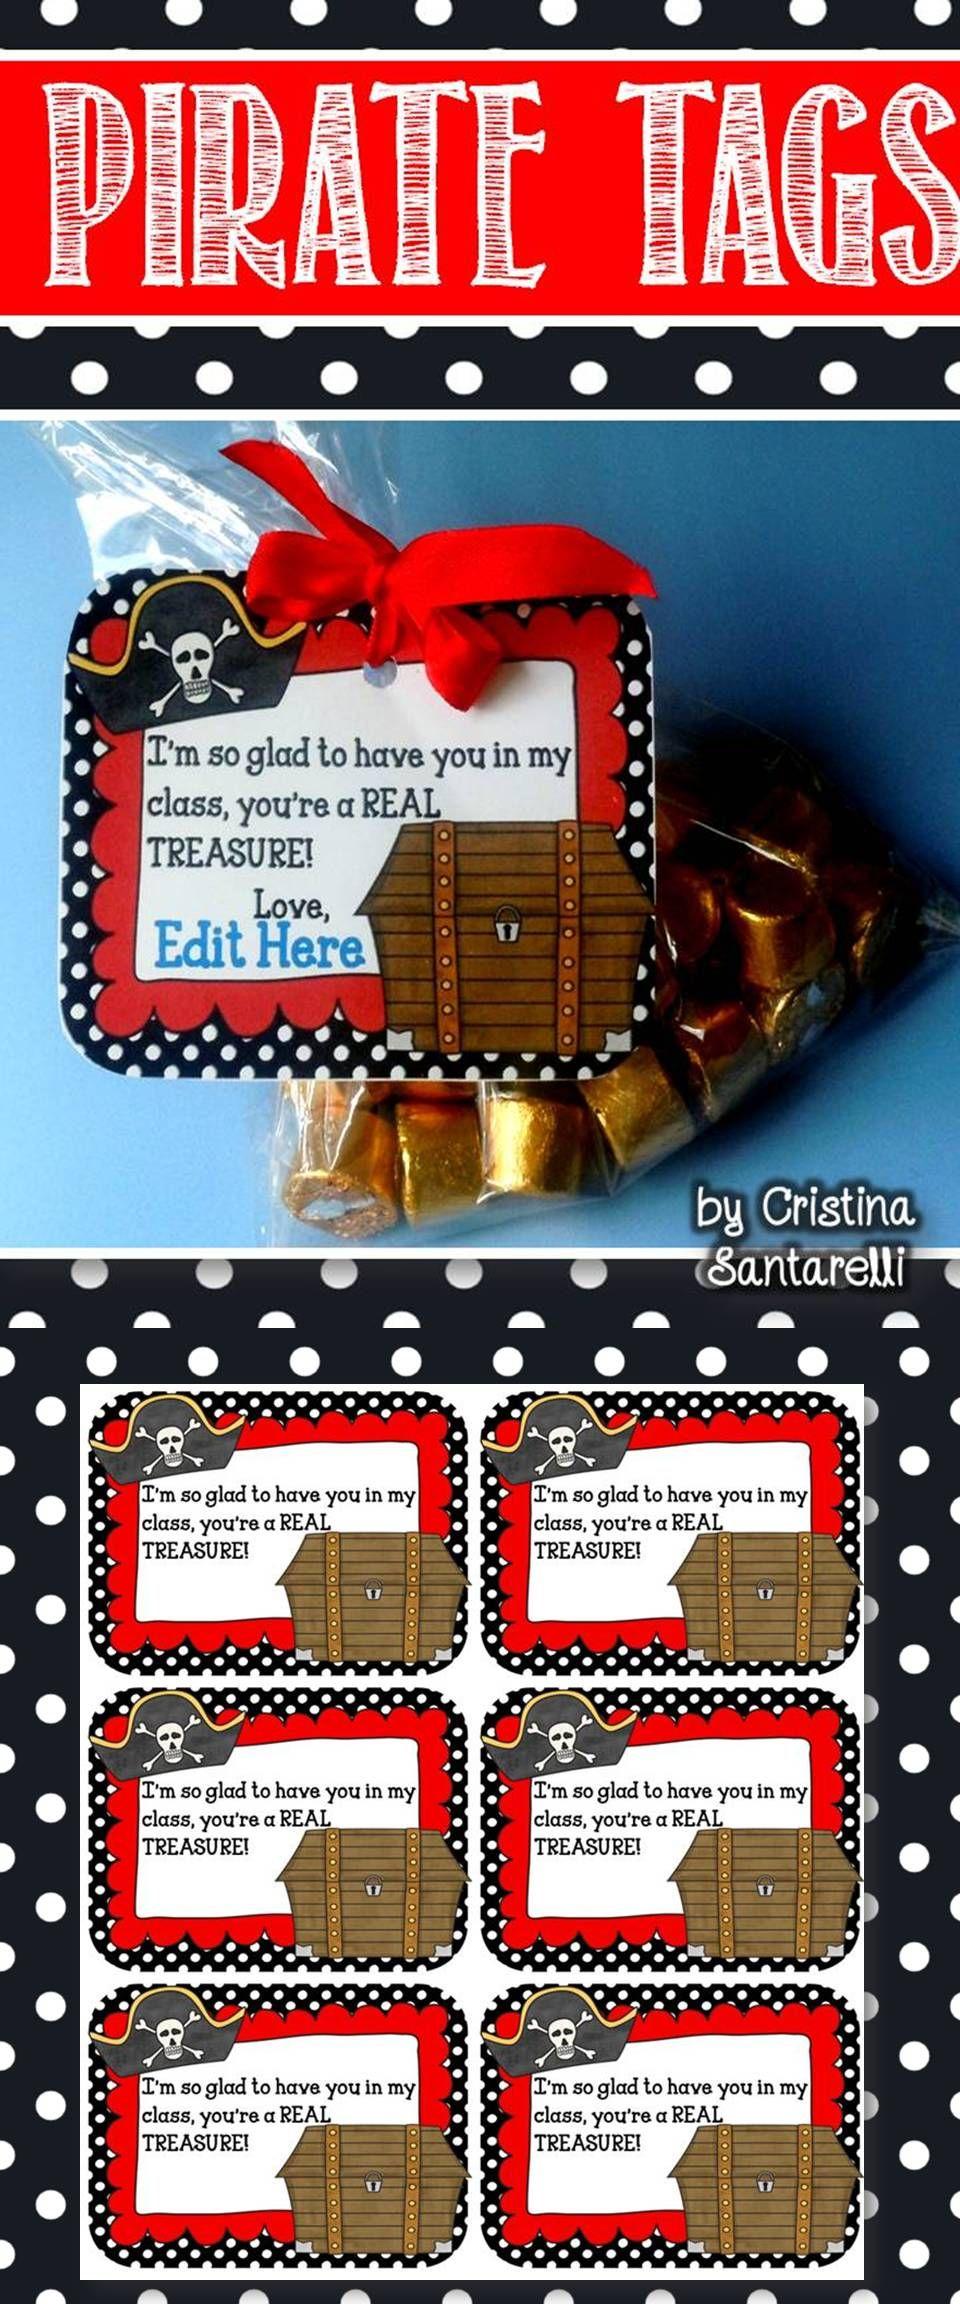 Pirate free | Right to read week | Pinterest | Piratas, Aula y ...